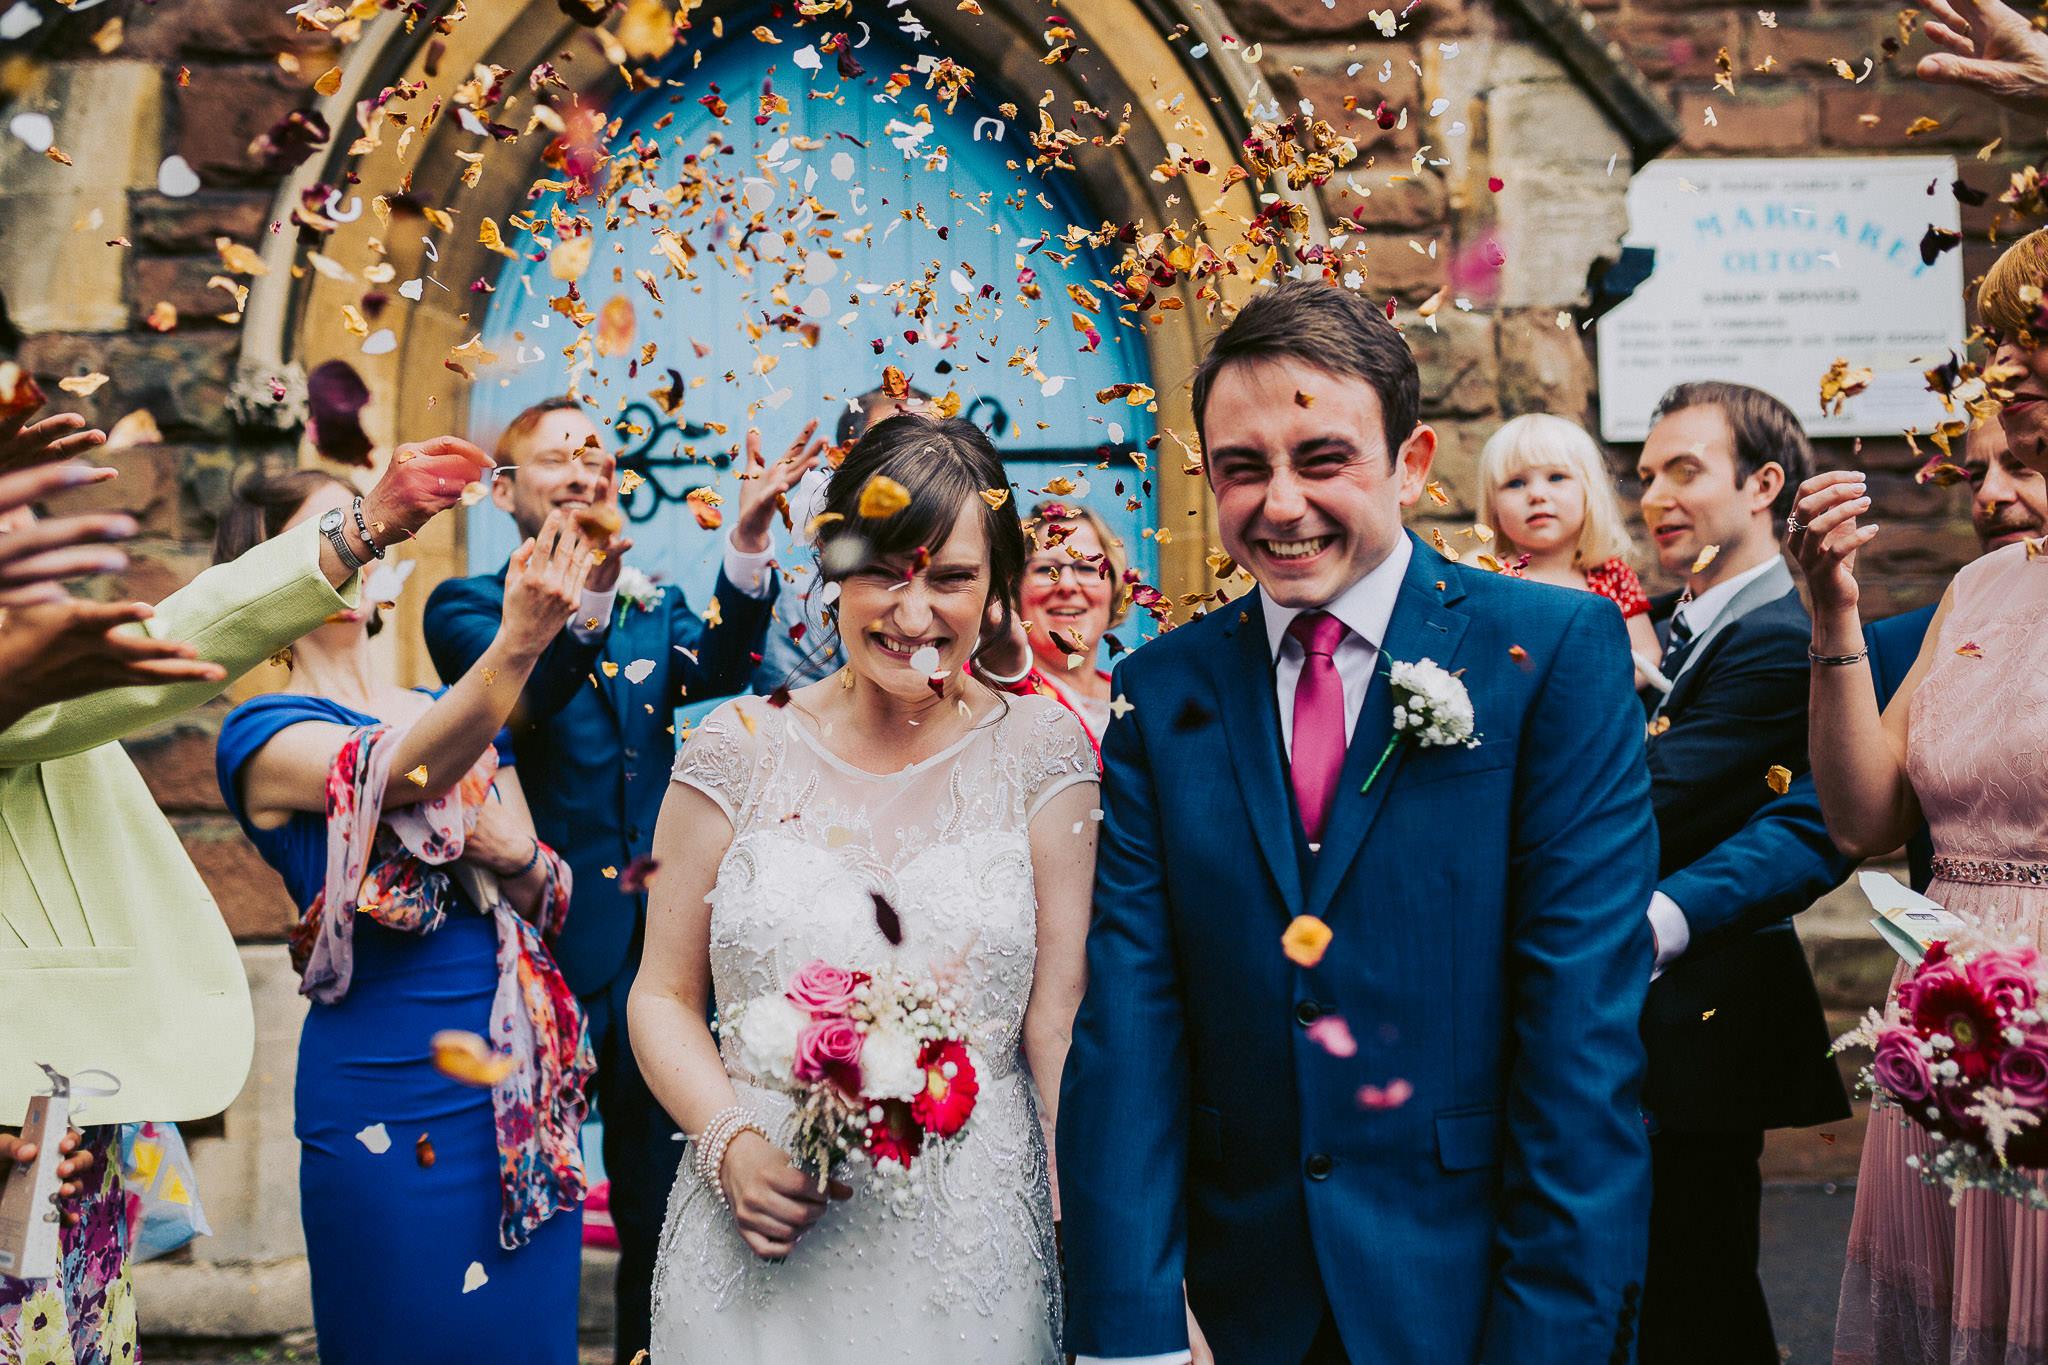 Staffordshire-Wedding-Photographer-151.jpg